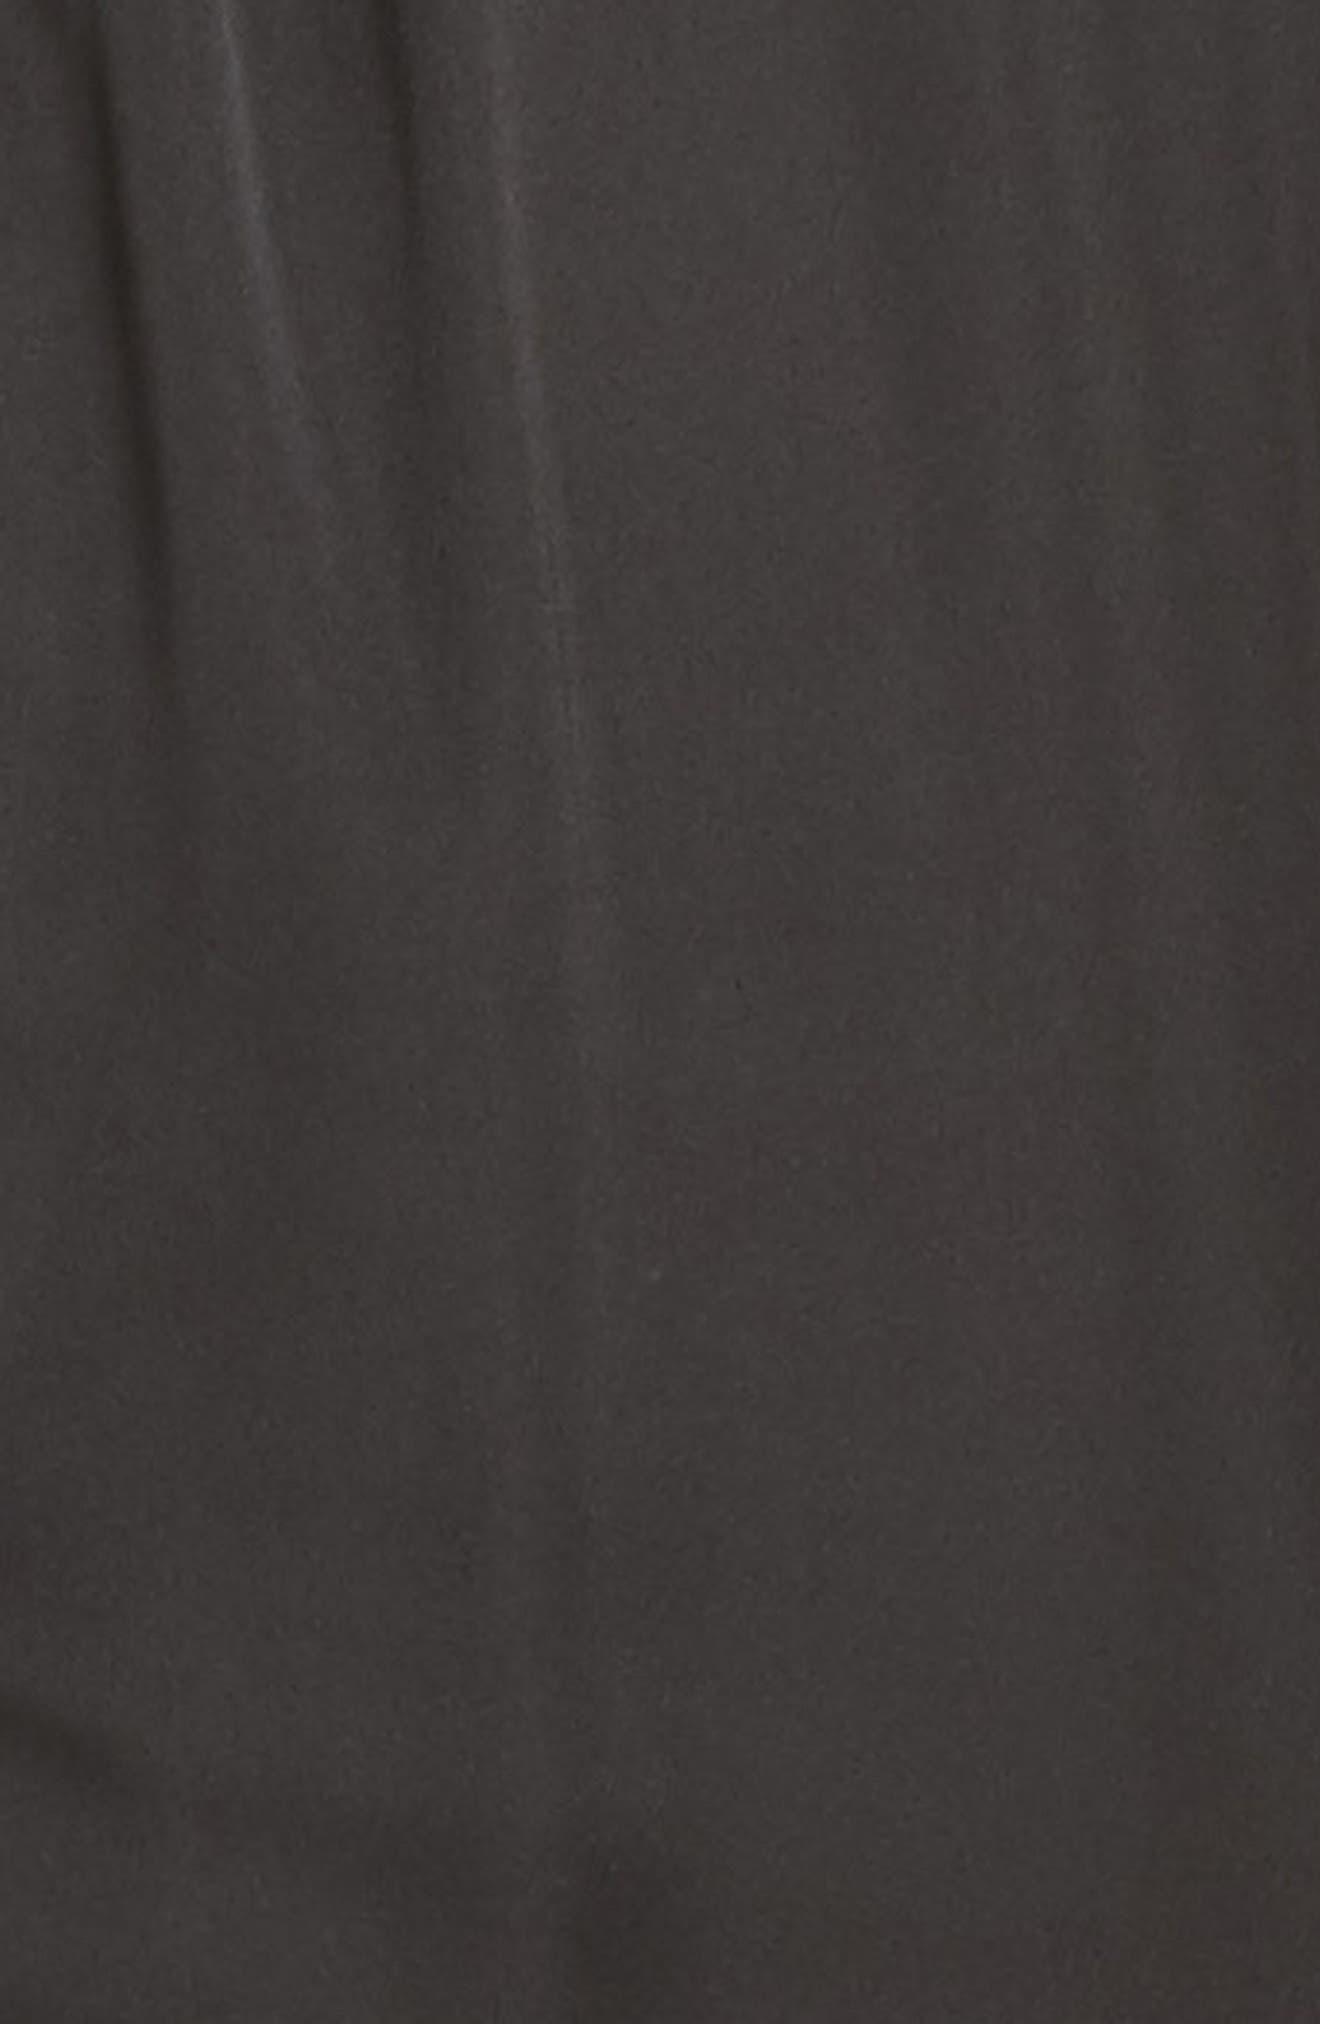 Abigail Secretary Satin Bodysuit,                             Alternate thumbnail 6, color,                             Noir